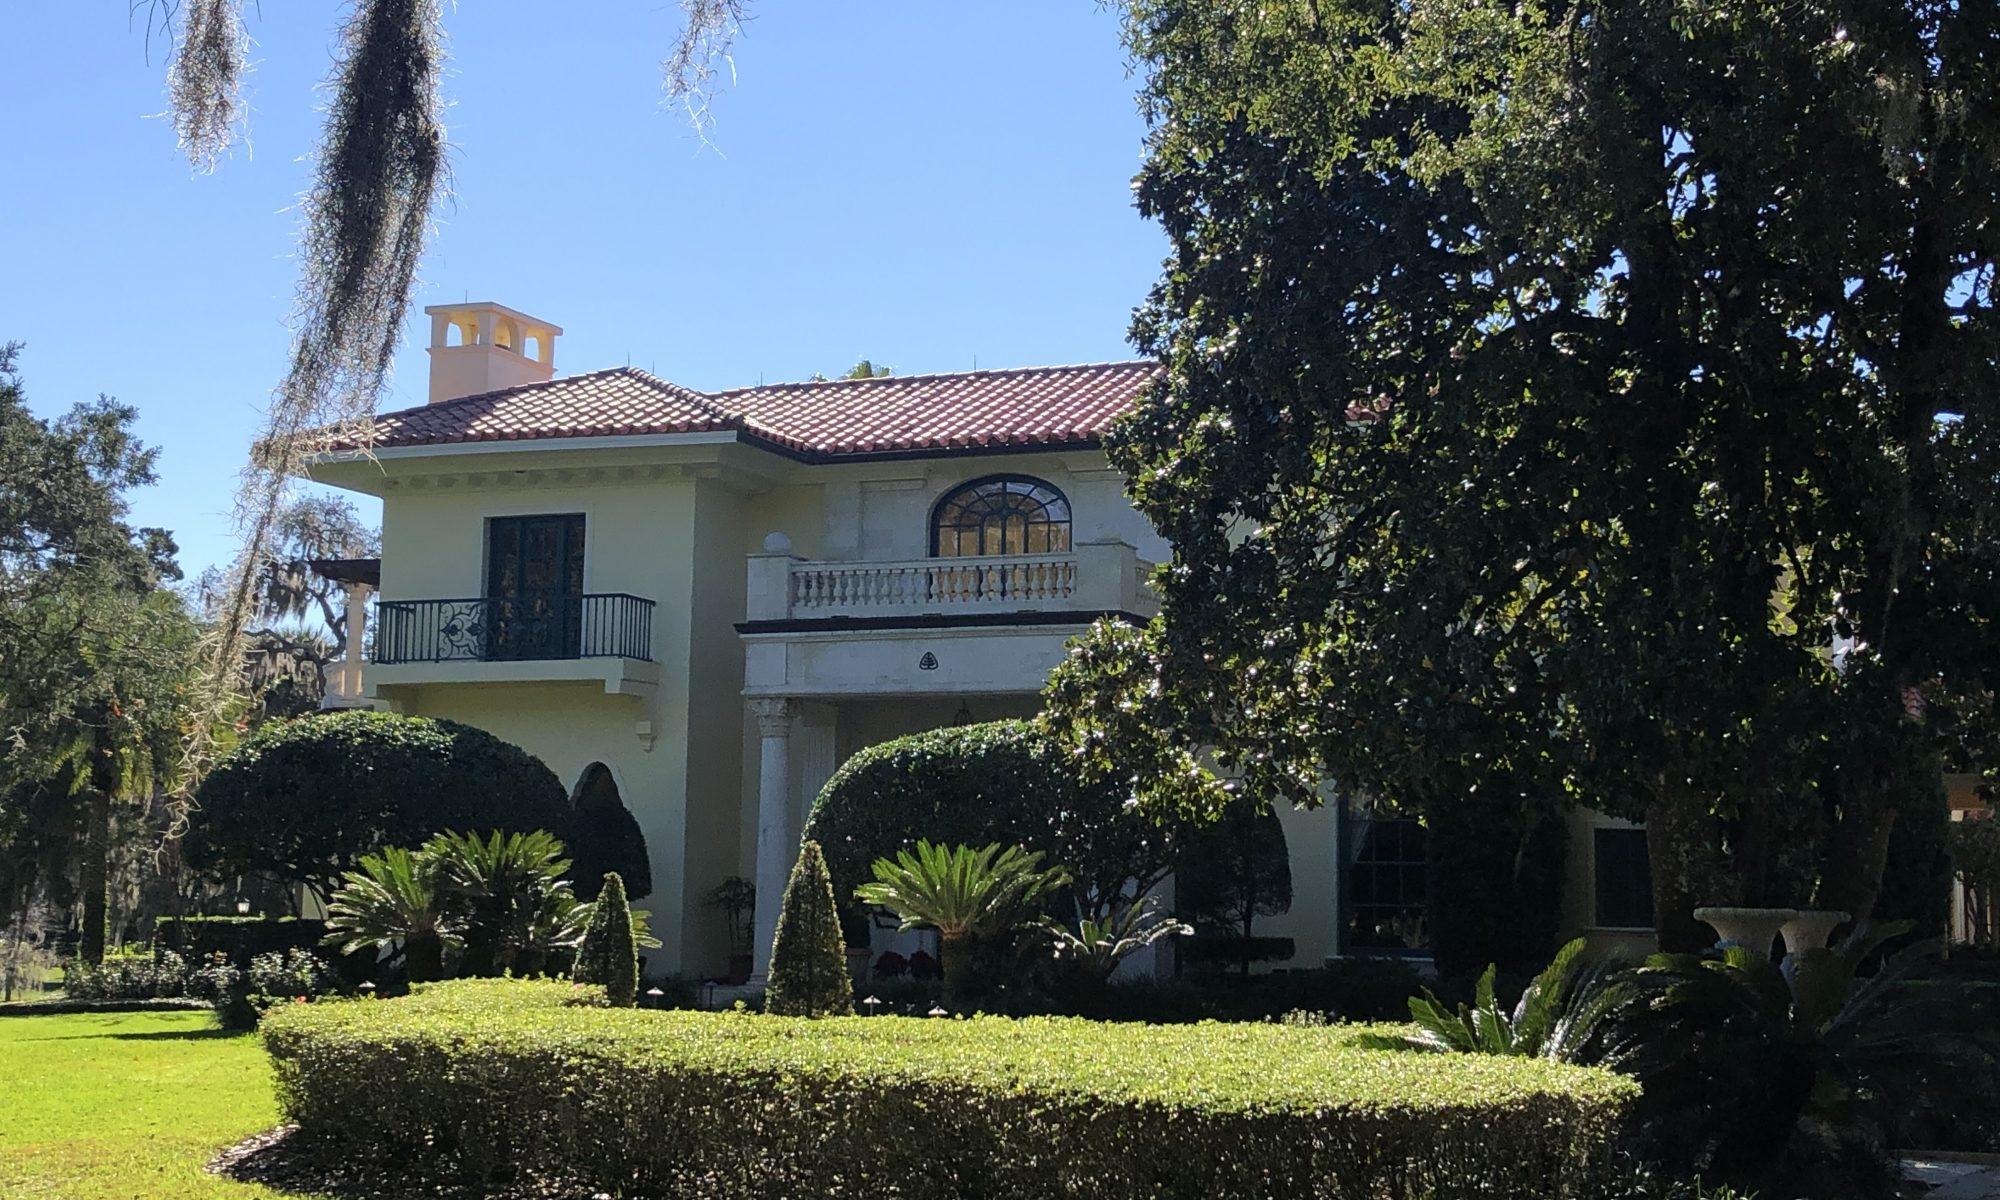 Ligonier Ministries Building, Sanford, Florida